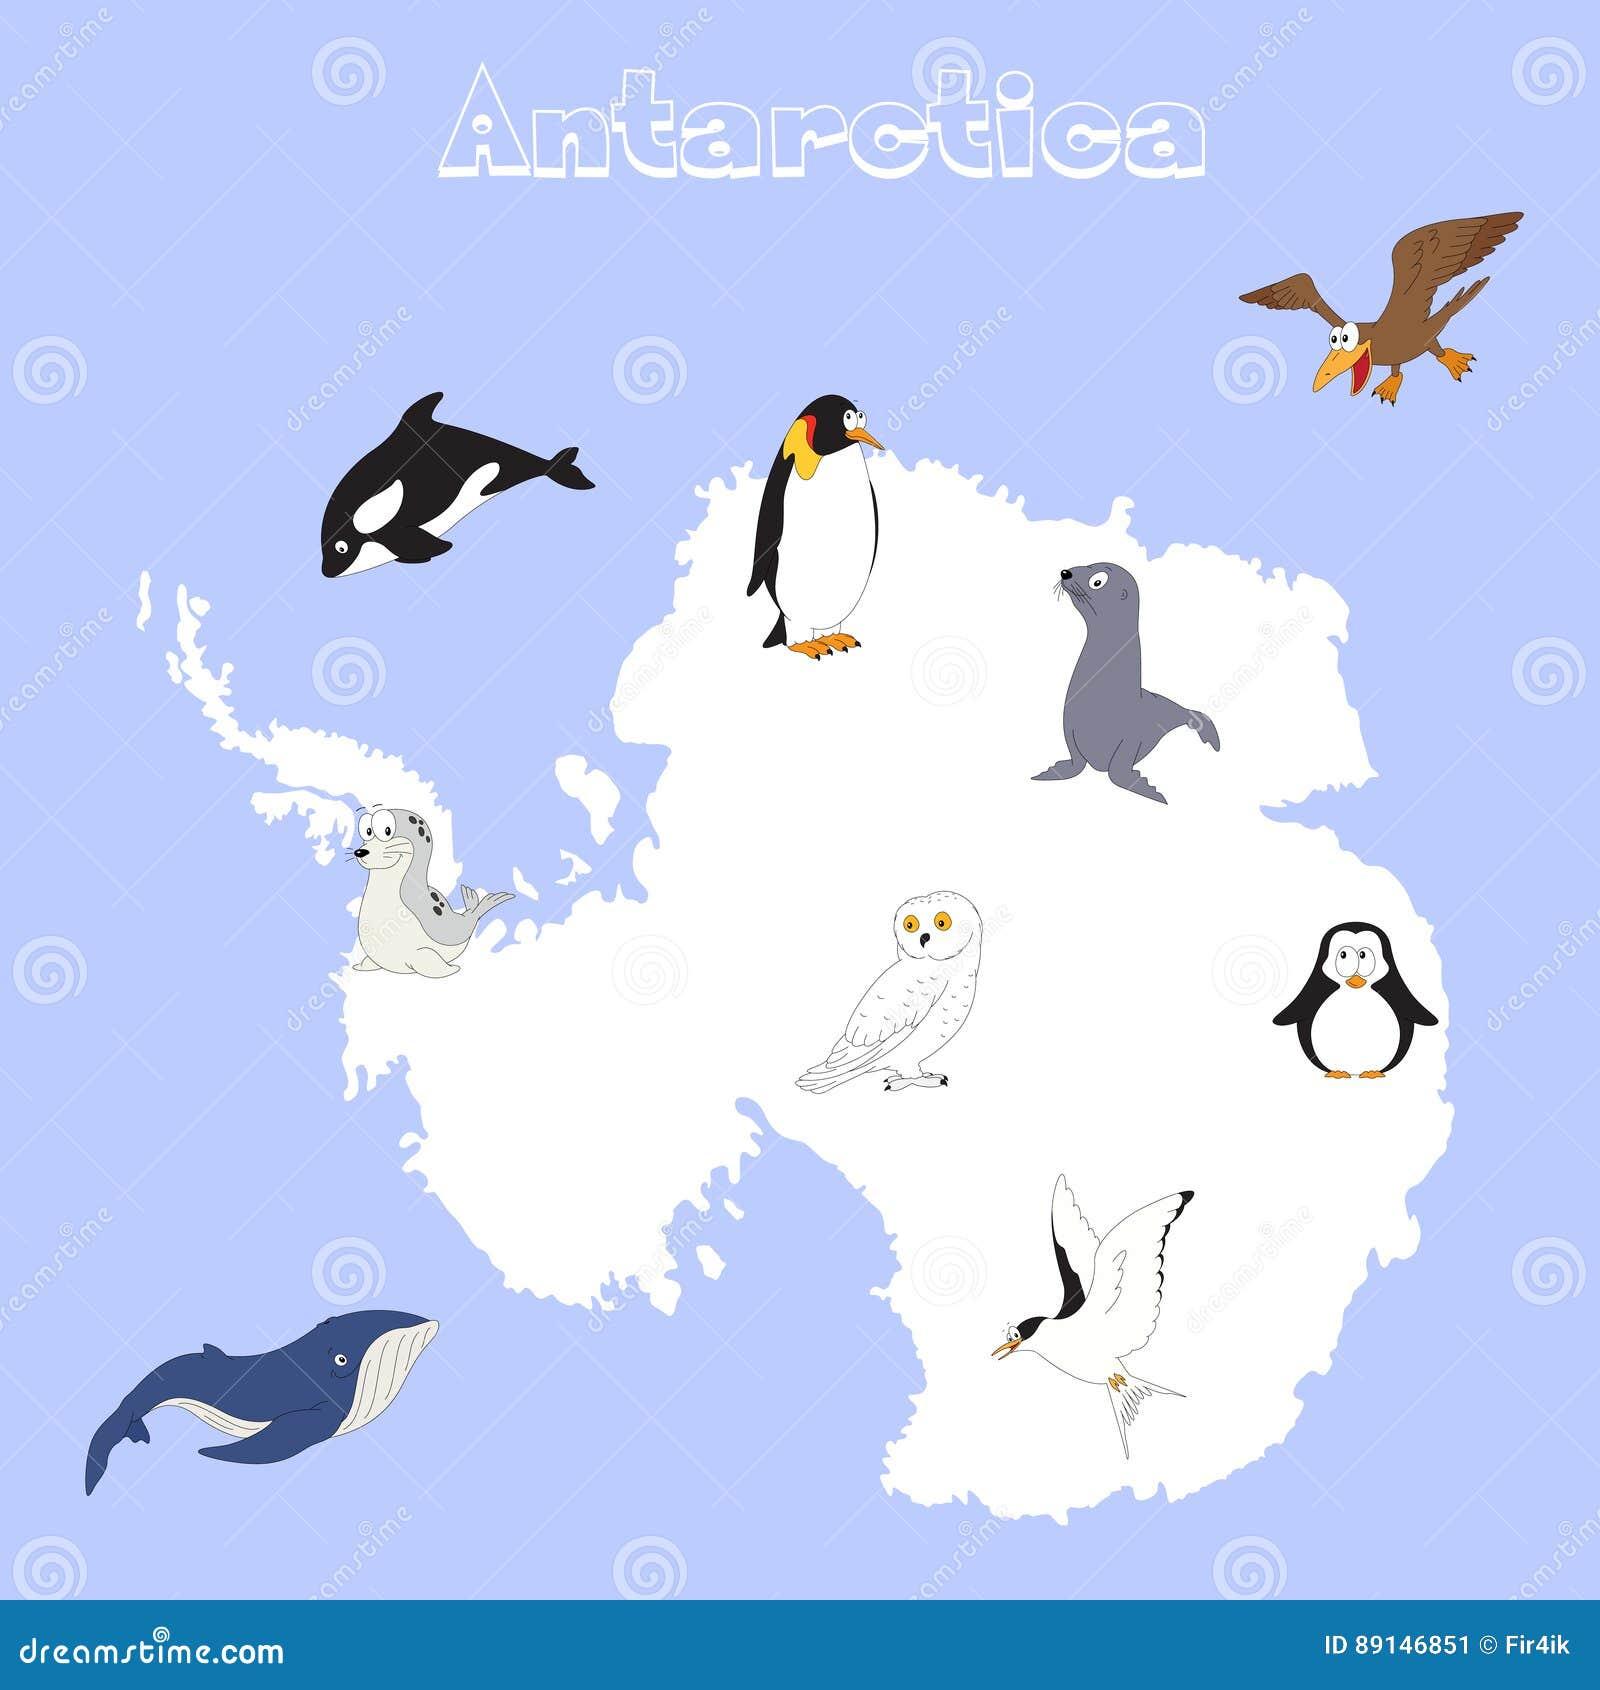 antarctic animals for kids - photo #19